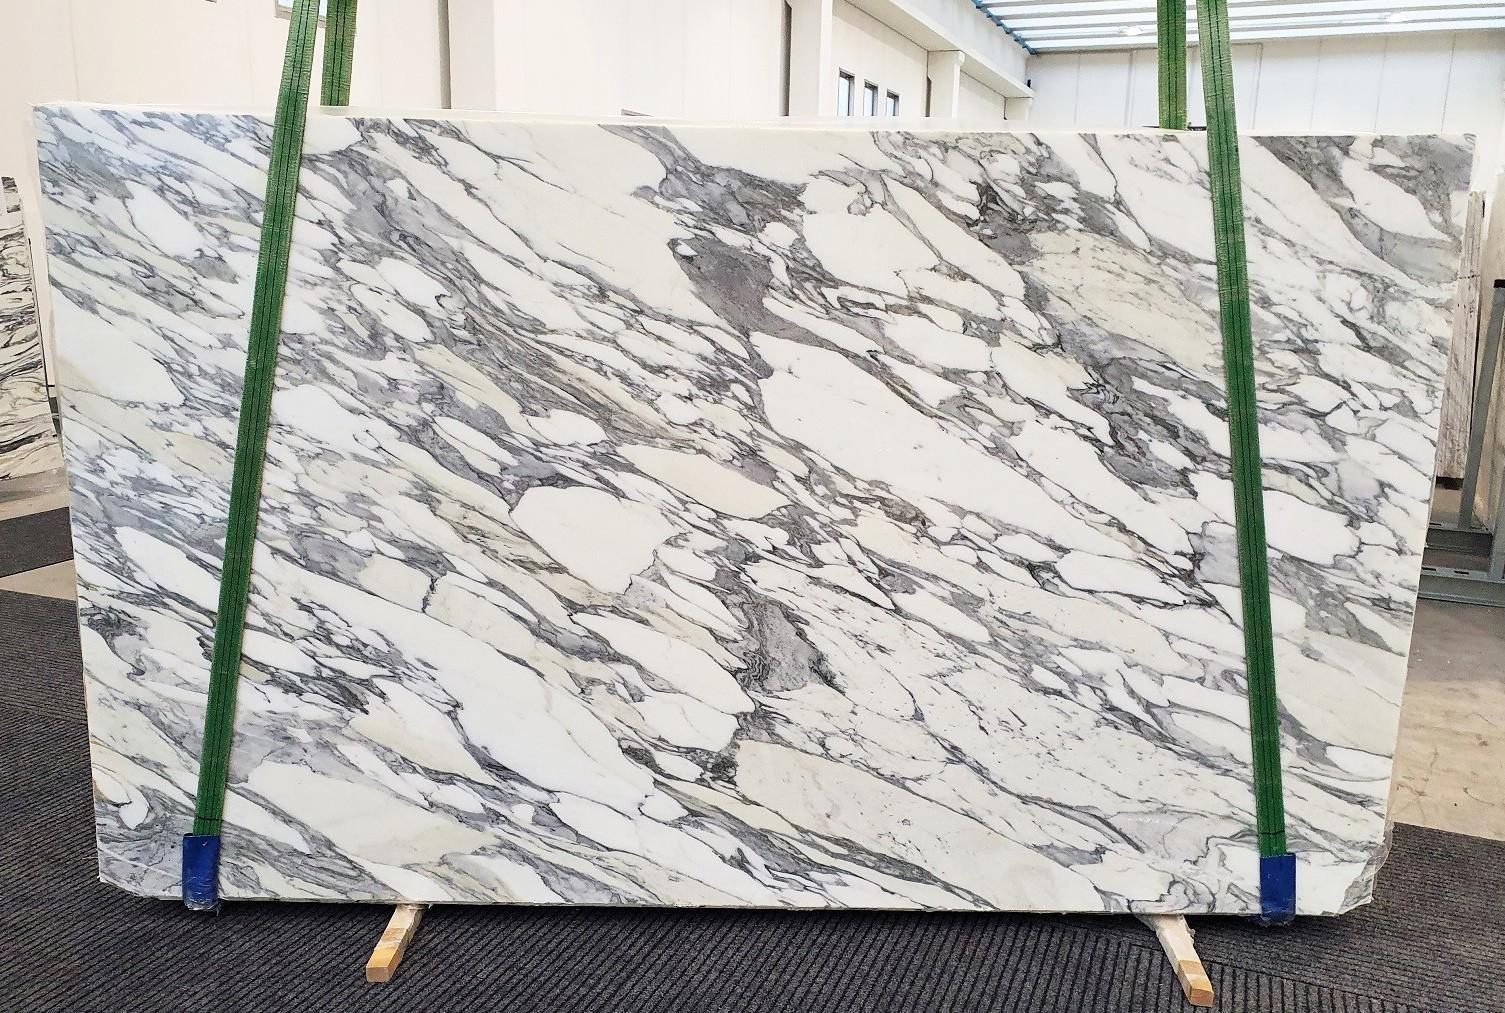 ARABESCATO CORCHIA Supply Veneto (Italy) polished slabs 1237 , Bundle #3 - SLab #25 natural marble